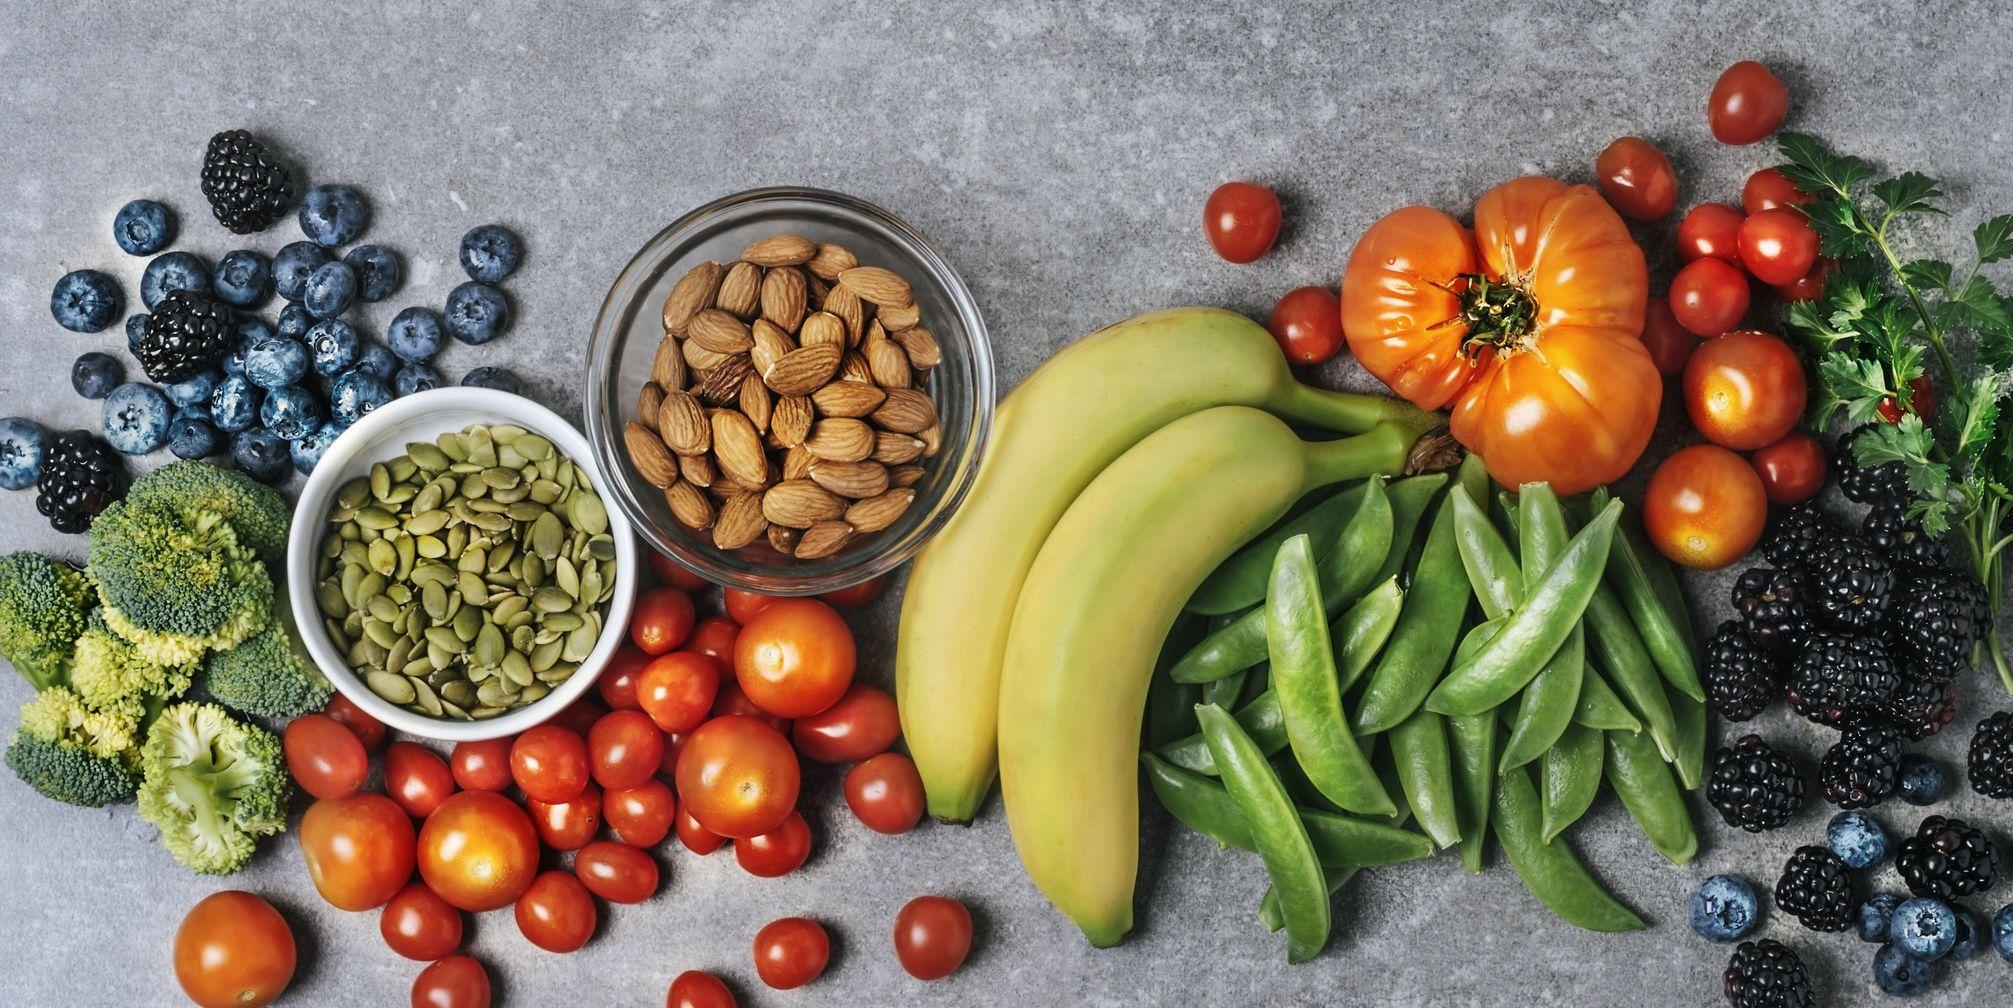 6 ways to eat yourself healthier